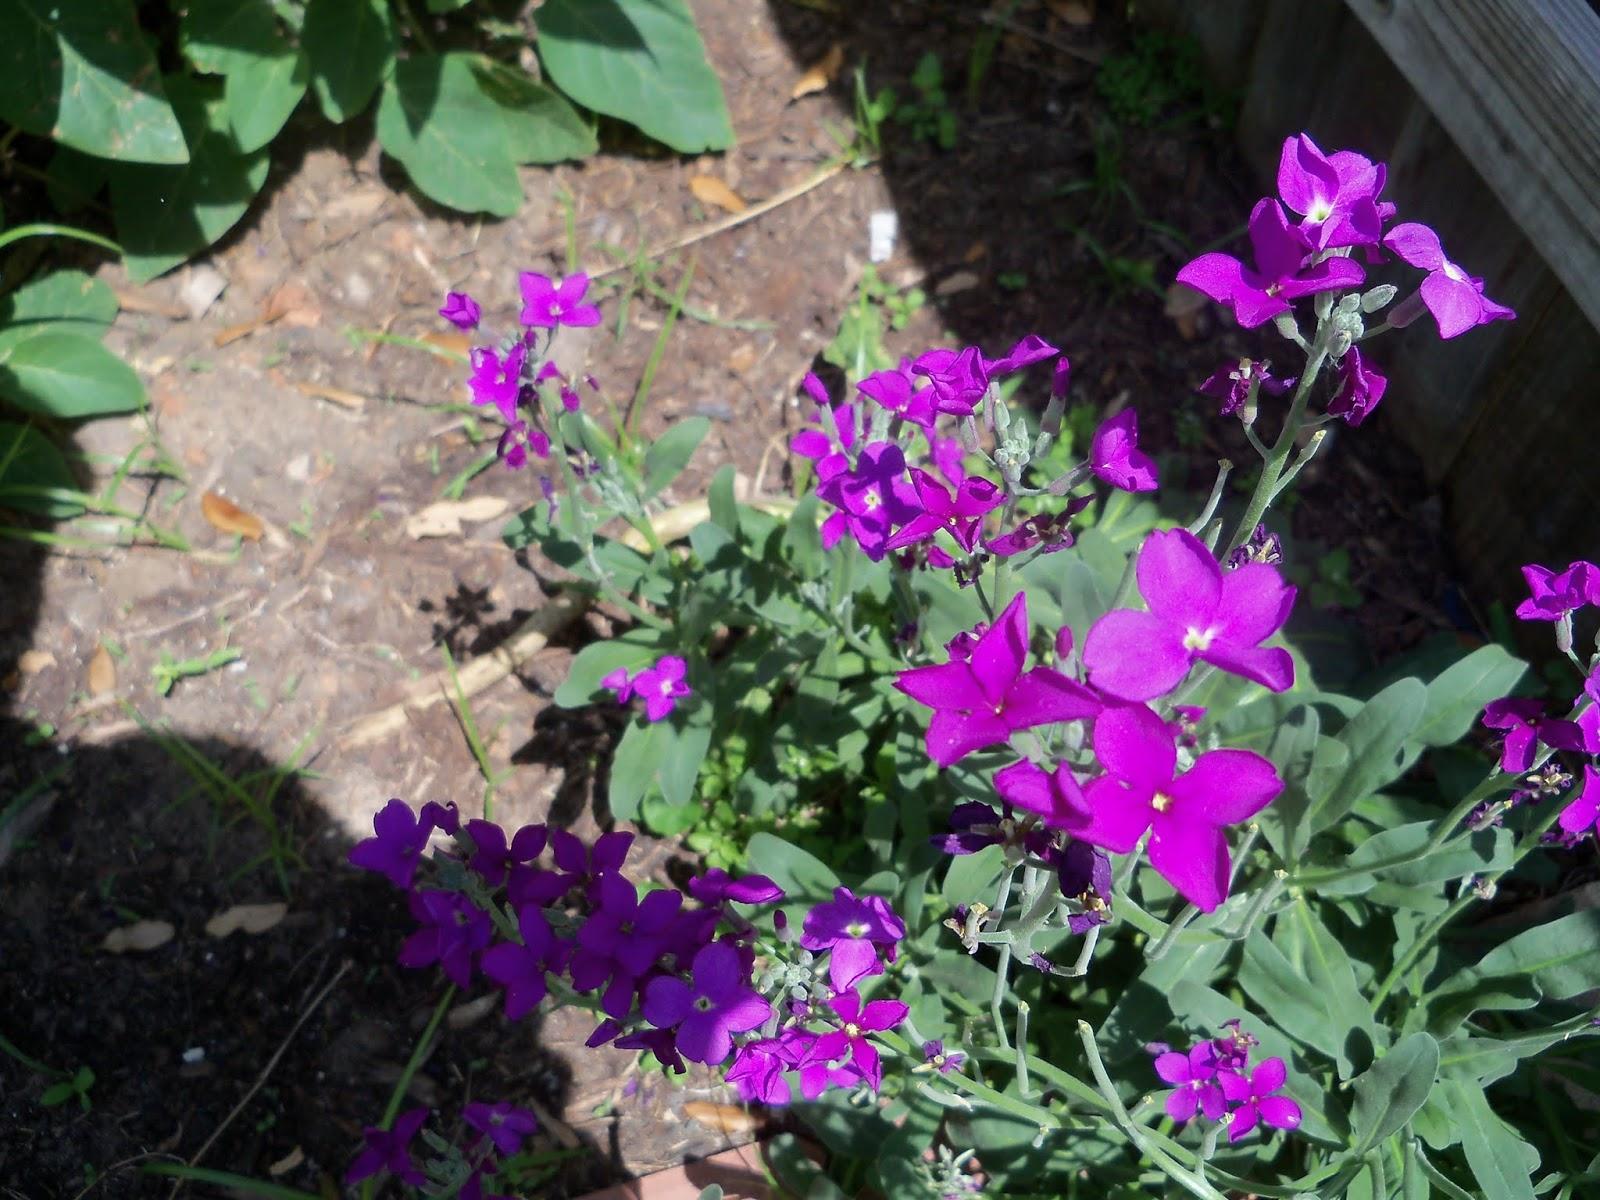 Gardening 2013 - 115_5706.JPG